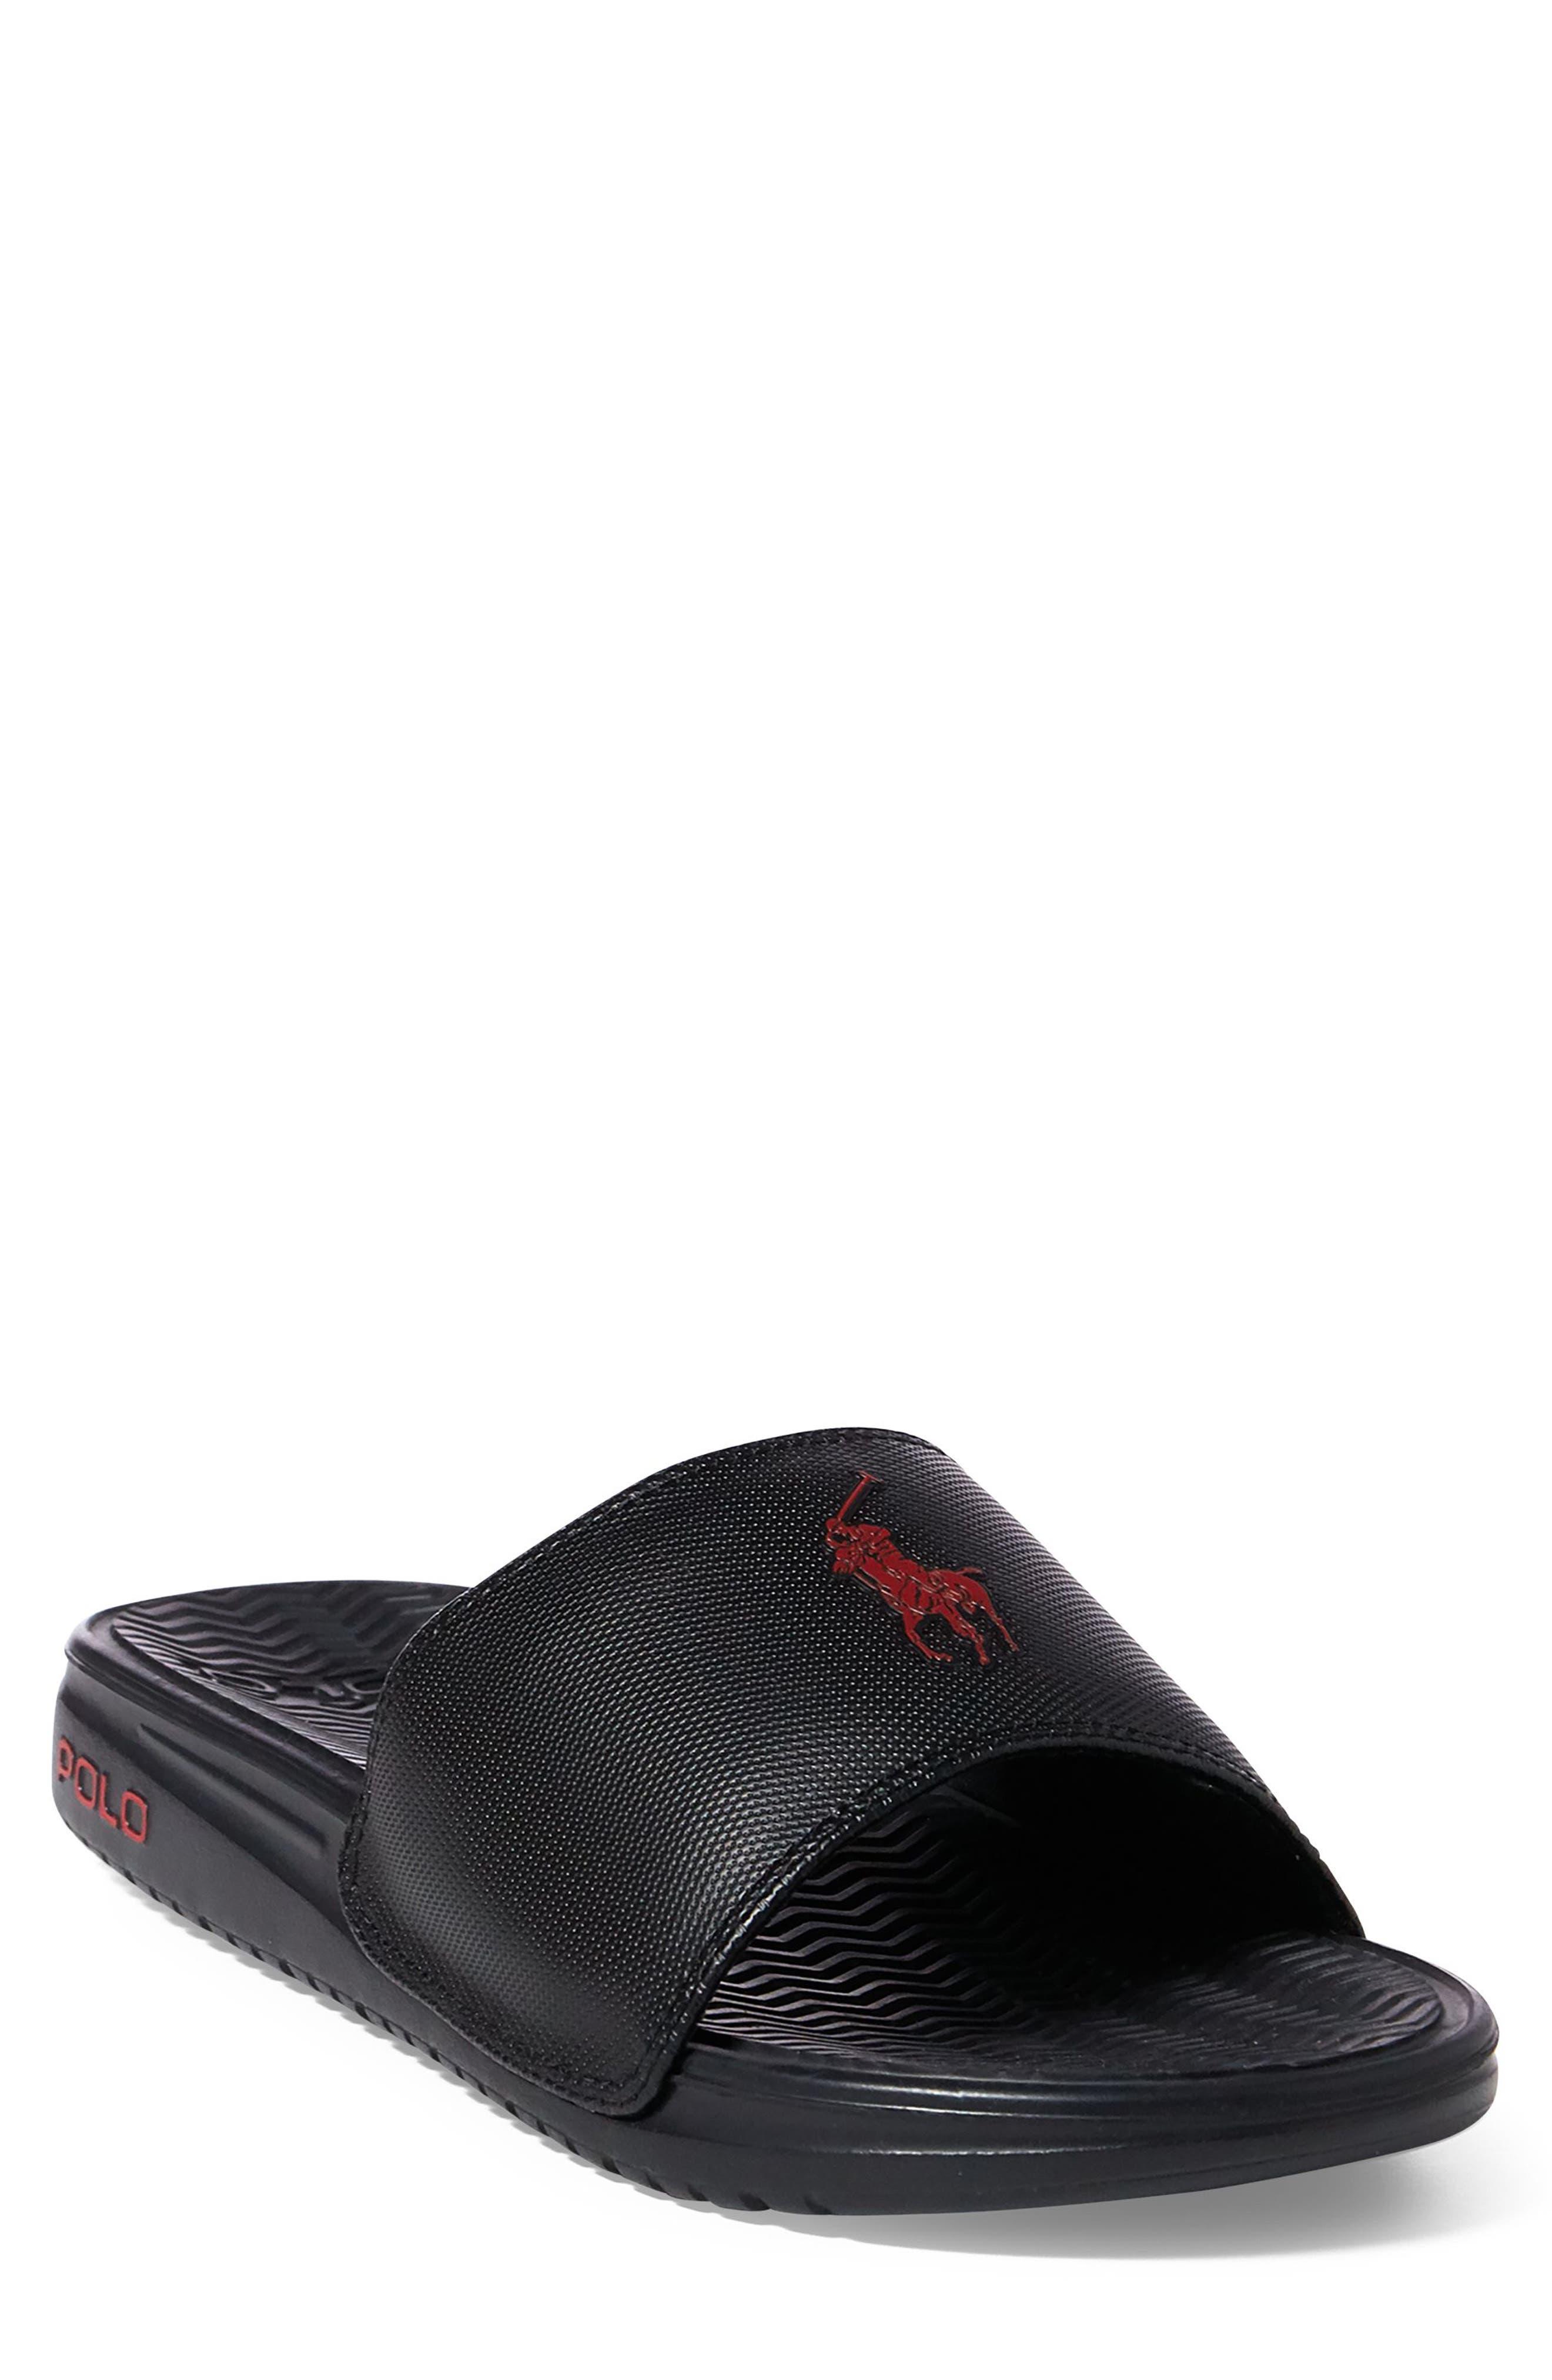 Polo Ralph Lauren Rodwell Slide Sandal